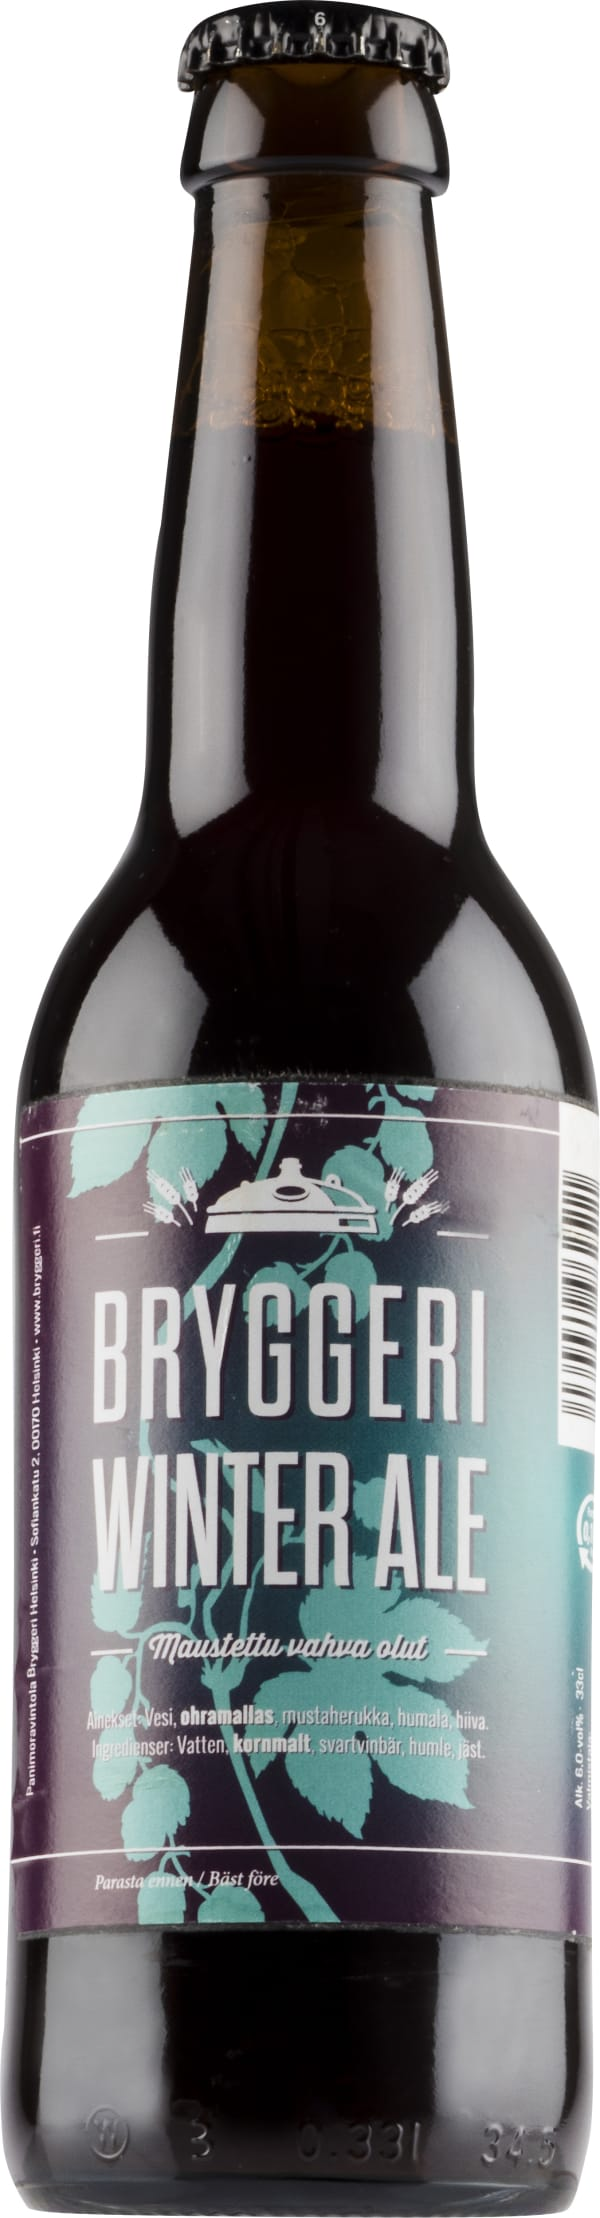 Bryggeri Winter Ale